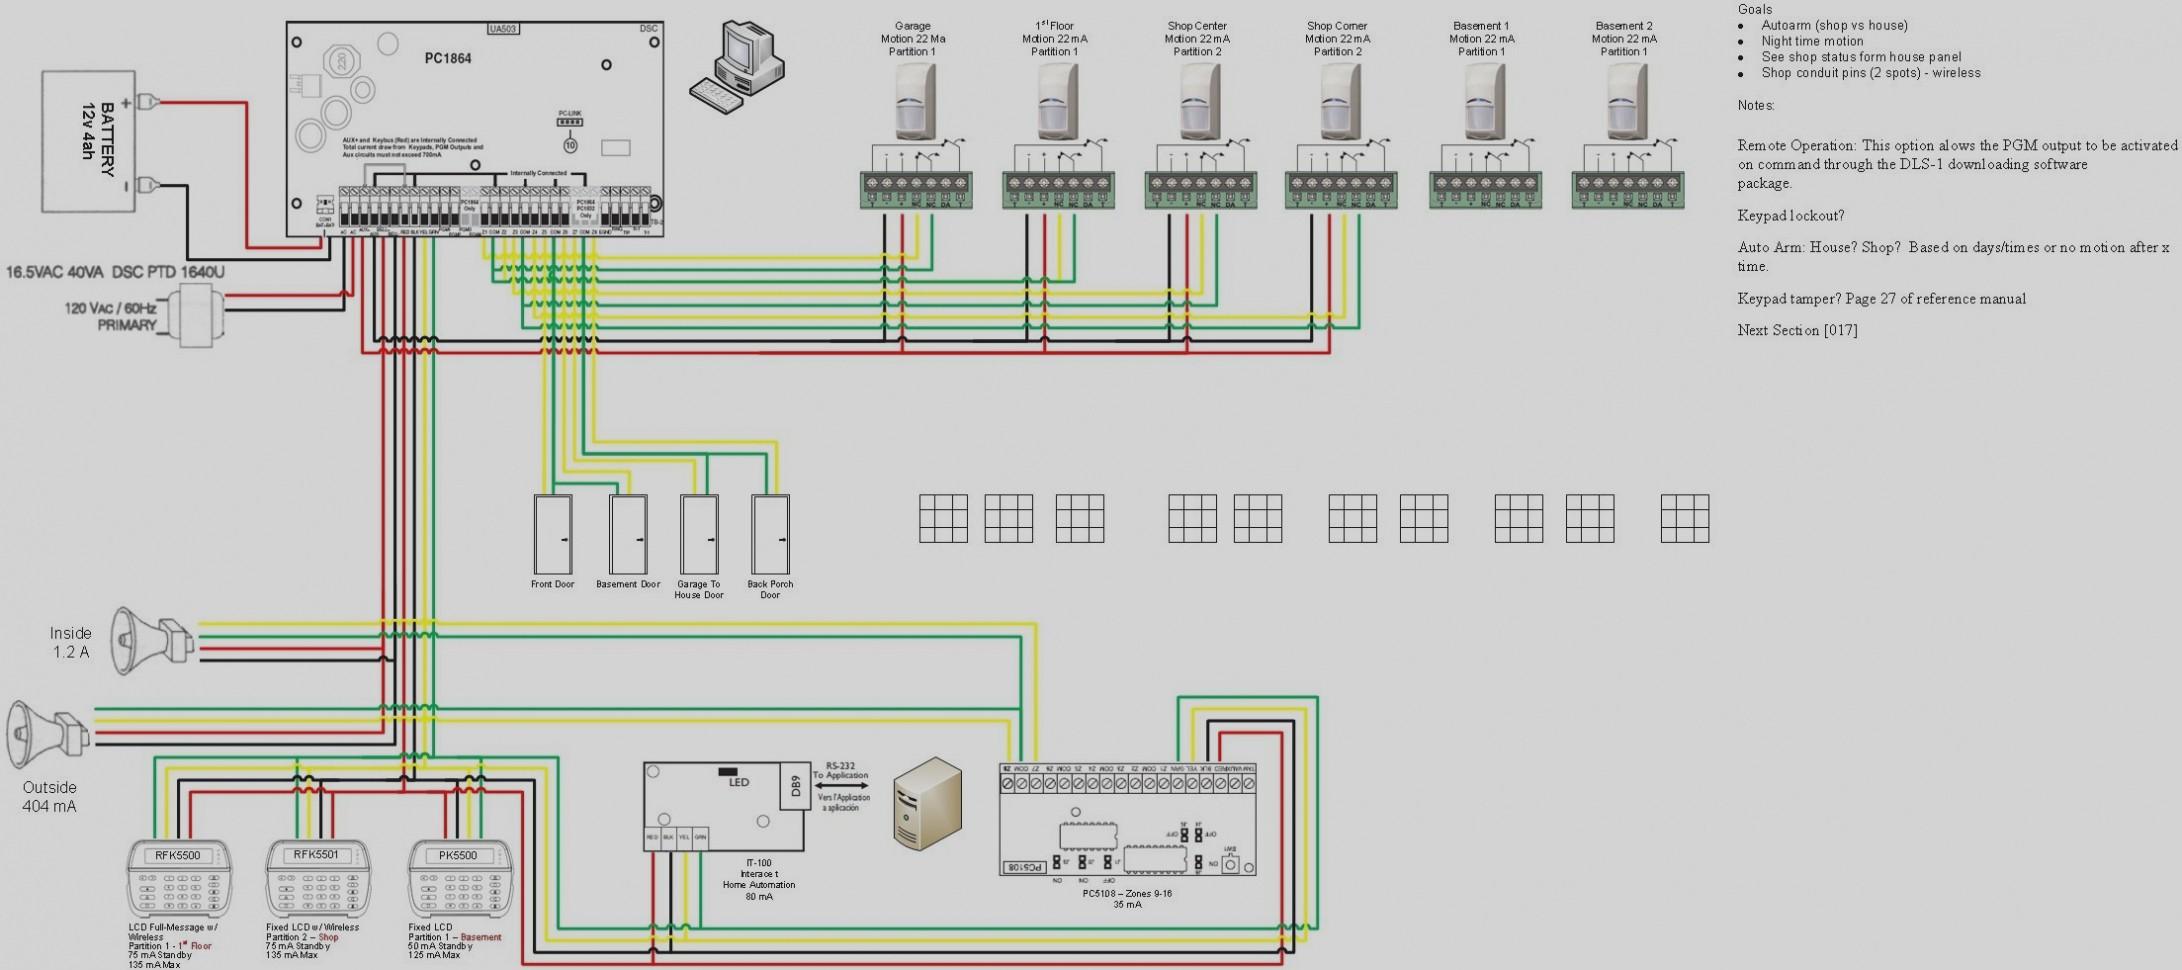 Unique Dsc 4 Wire Smoke Alarm Wiring Diagram With Relay Burglar Free Download Diagrams